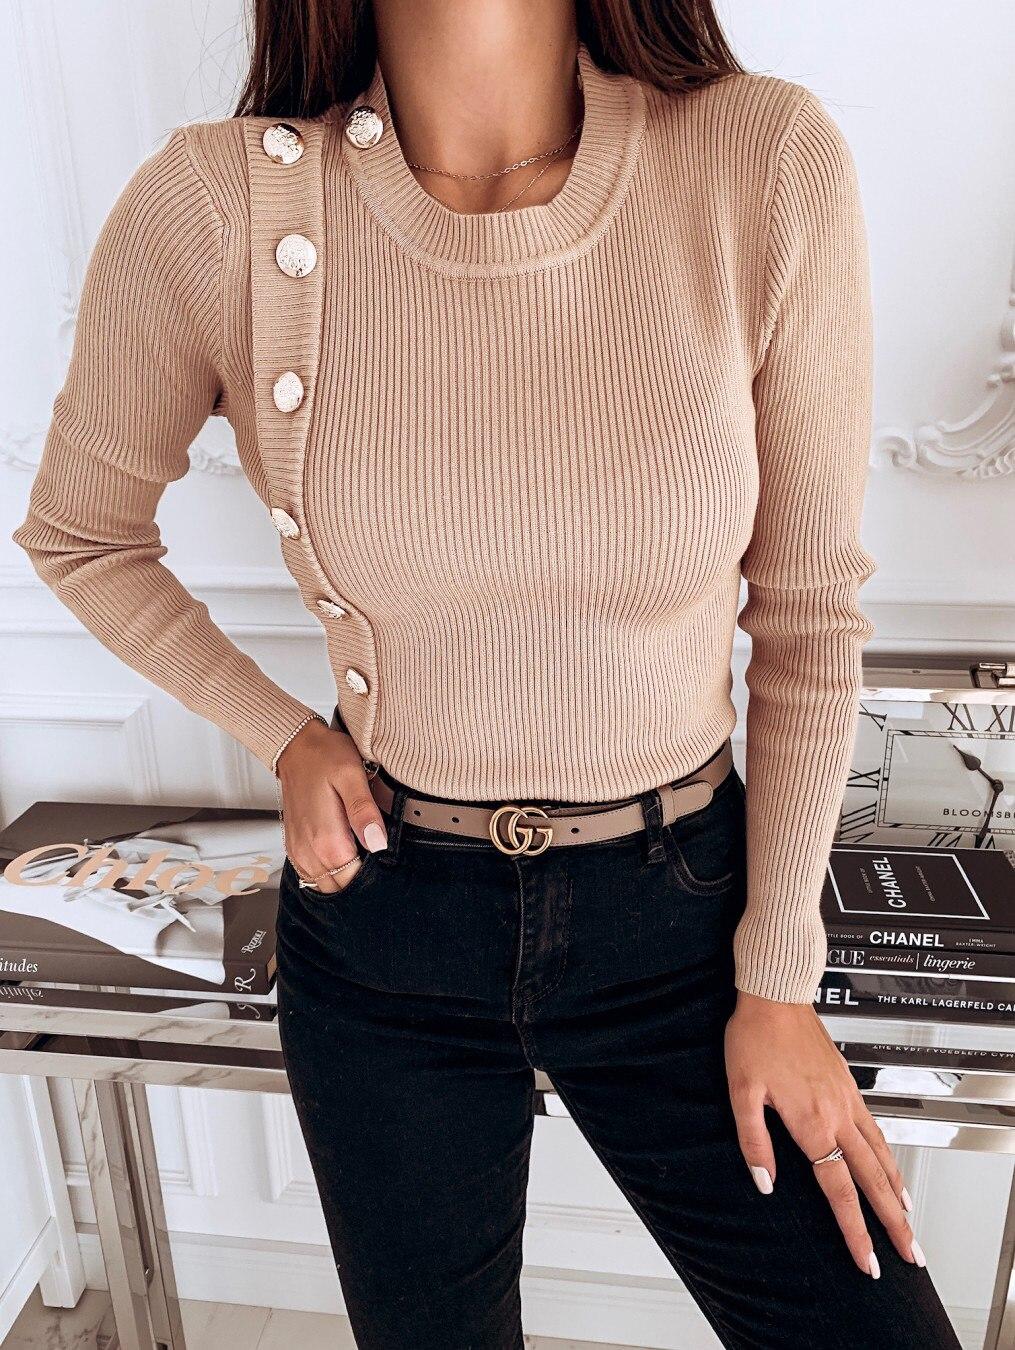 Women Sweaters 2019 Autumn Winter Casual Knitted Irregular Button Sweater Jumper Long Sleeve O Neck Pullover Slim Top Femme